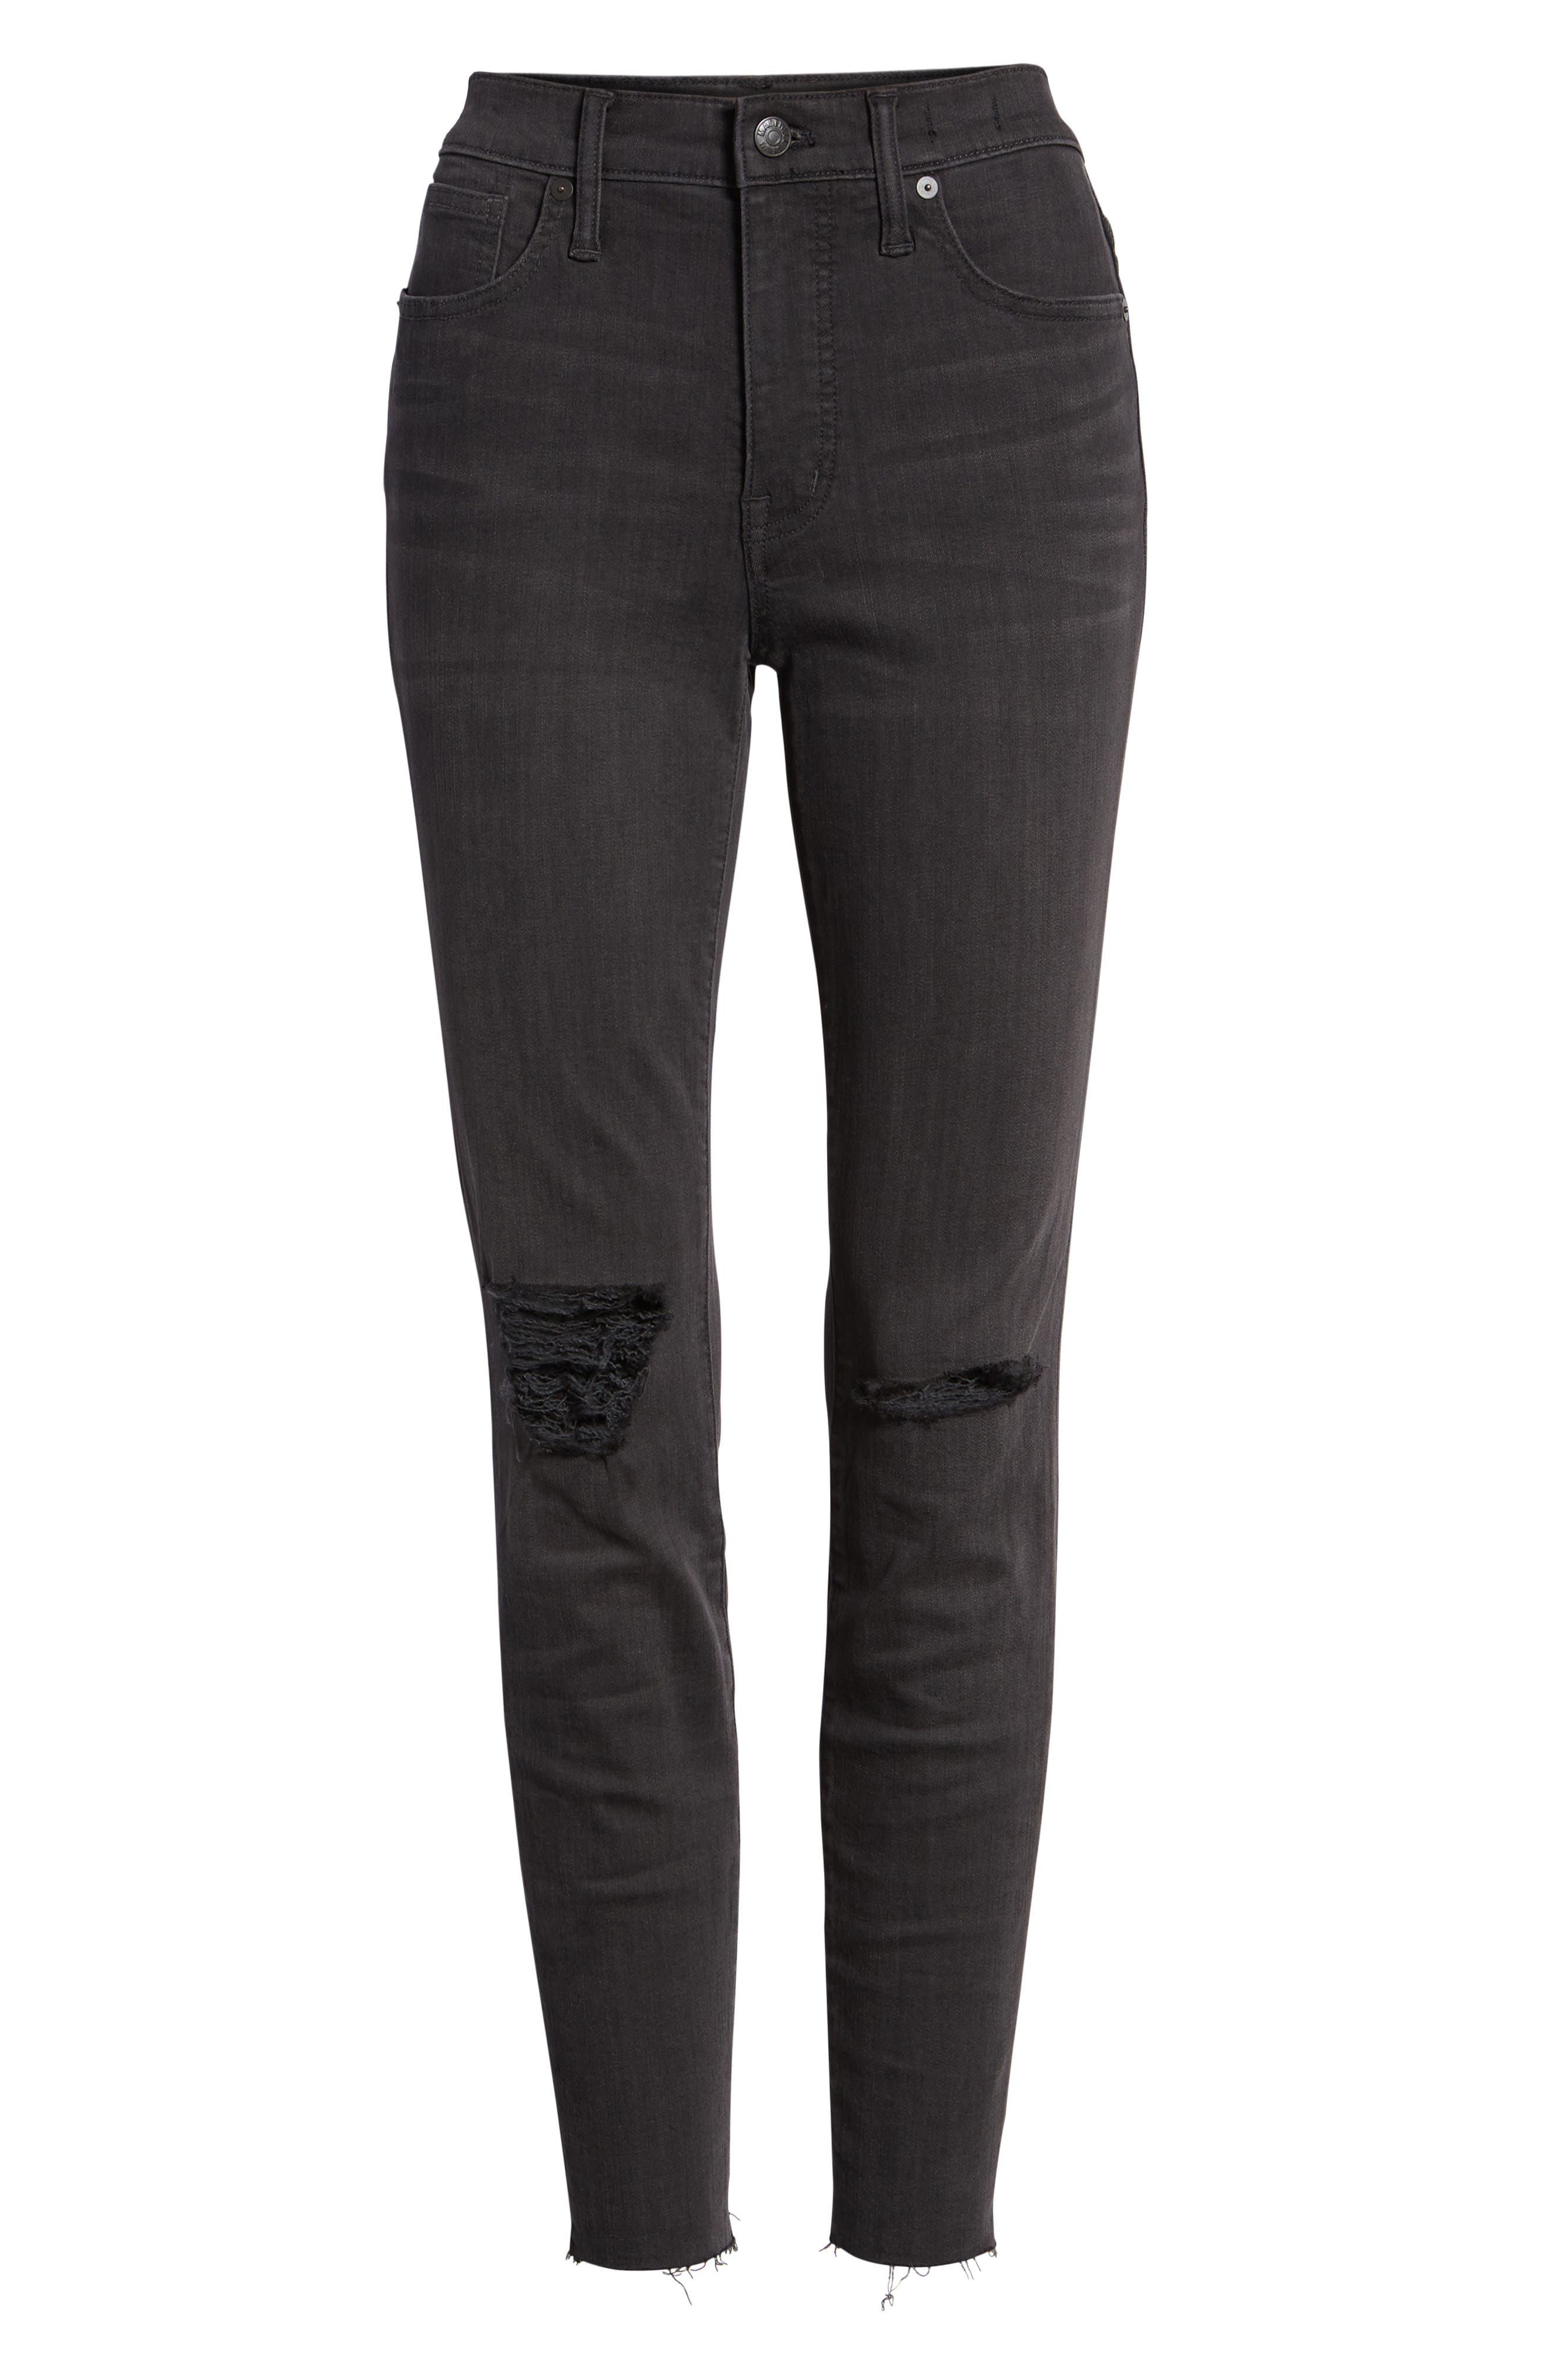 9-Inch High Waist Skinny Jeans,                             Alternate thumbnail 4, color,                             BLACK SEA